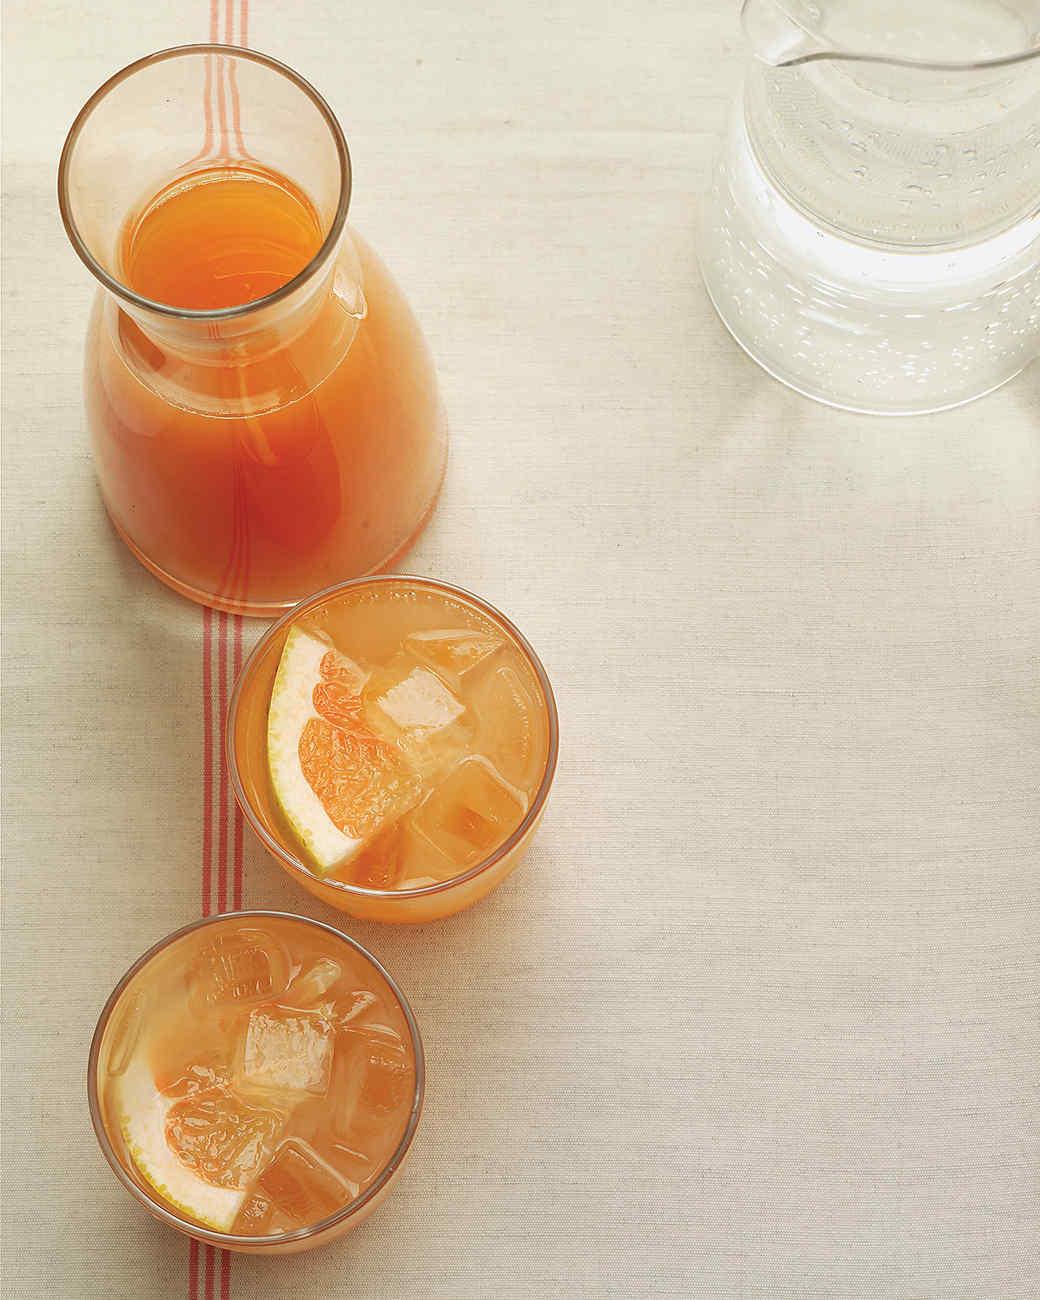 Ginger-Grapefruit Spritzer